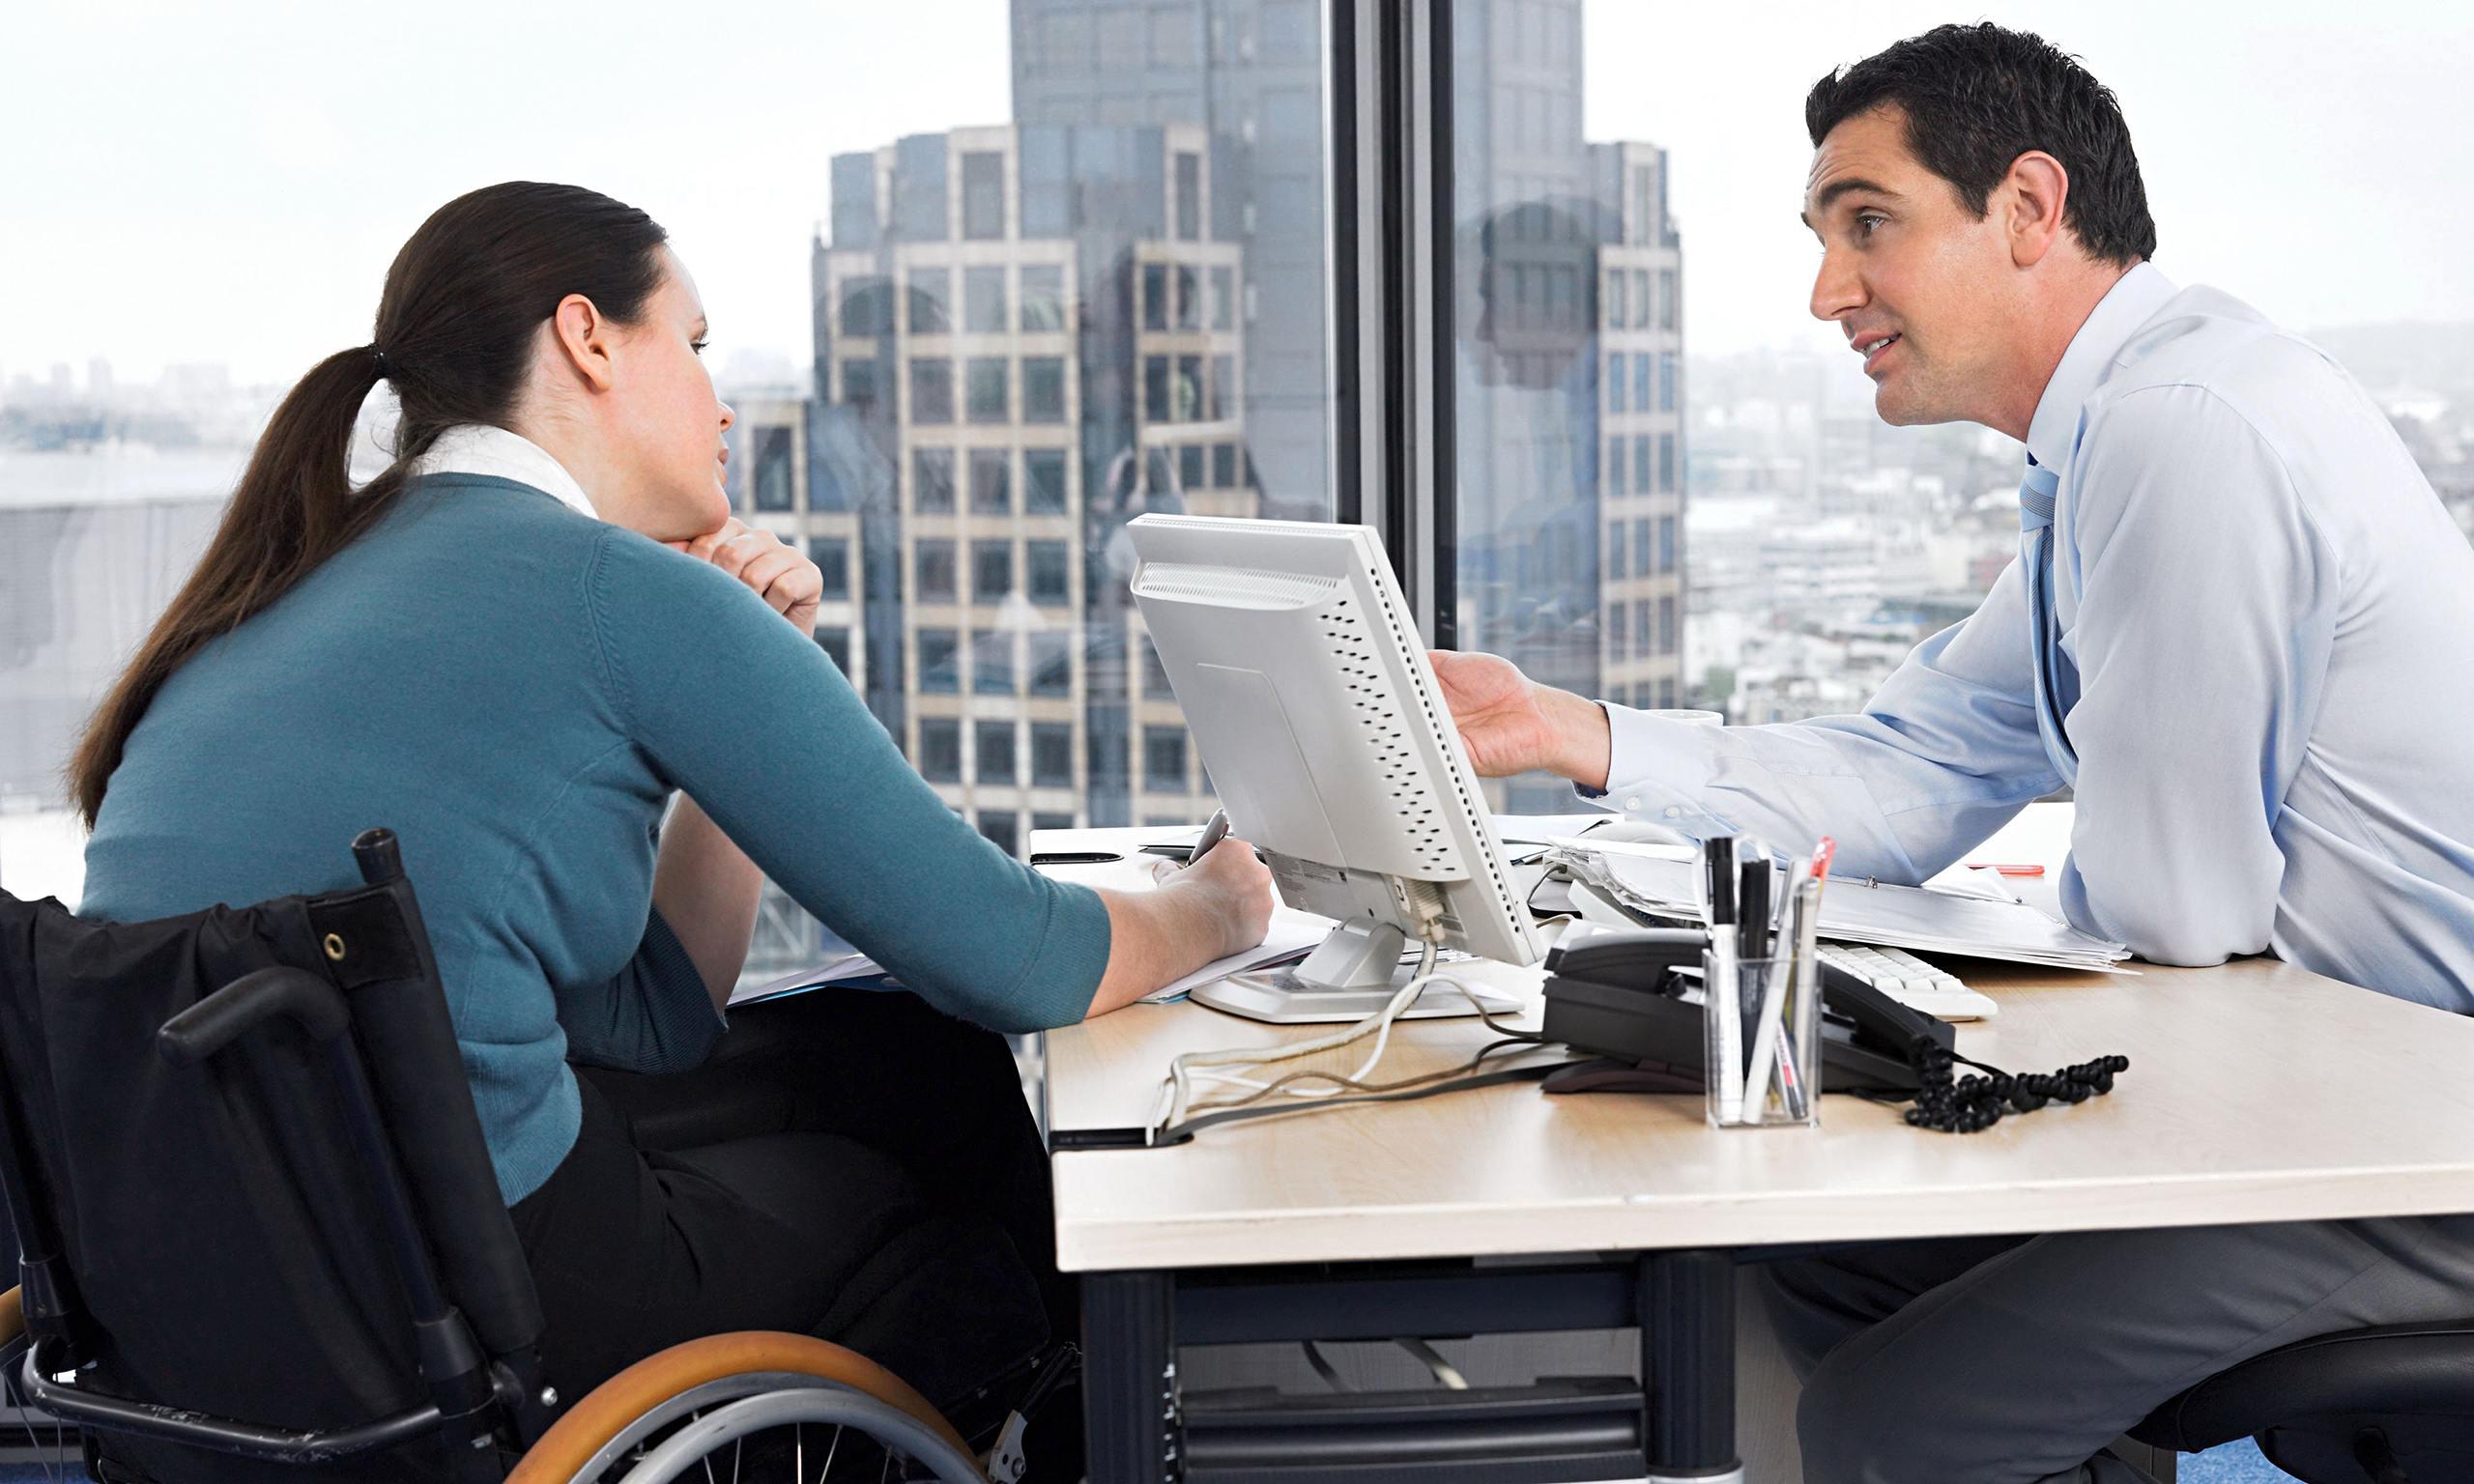 Доп соглашение при отмене инвалидности